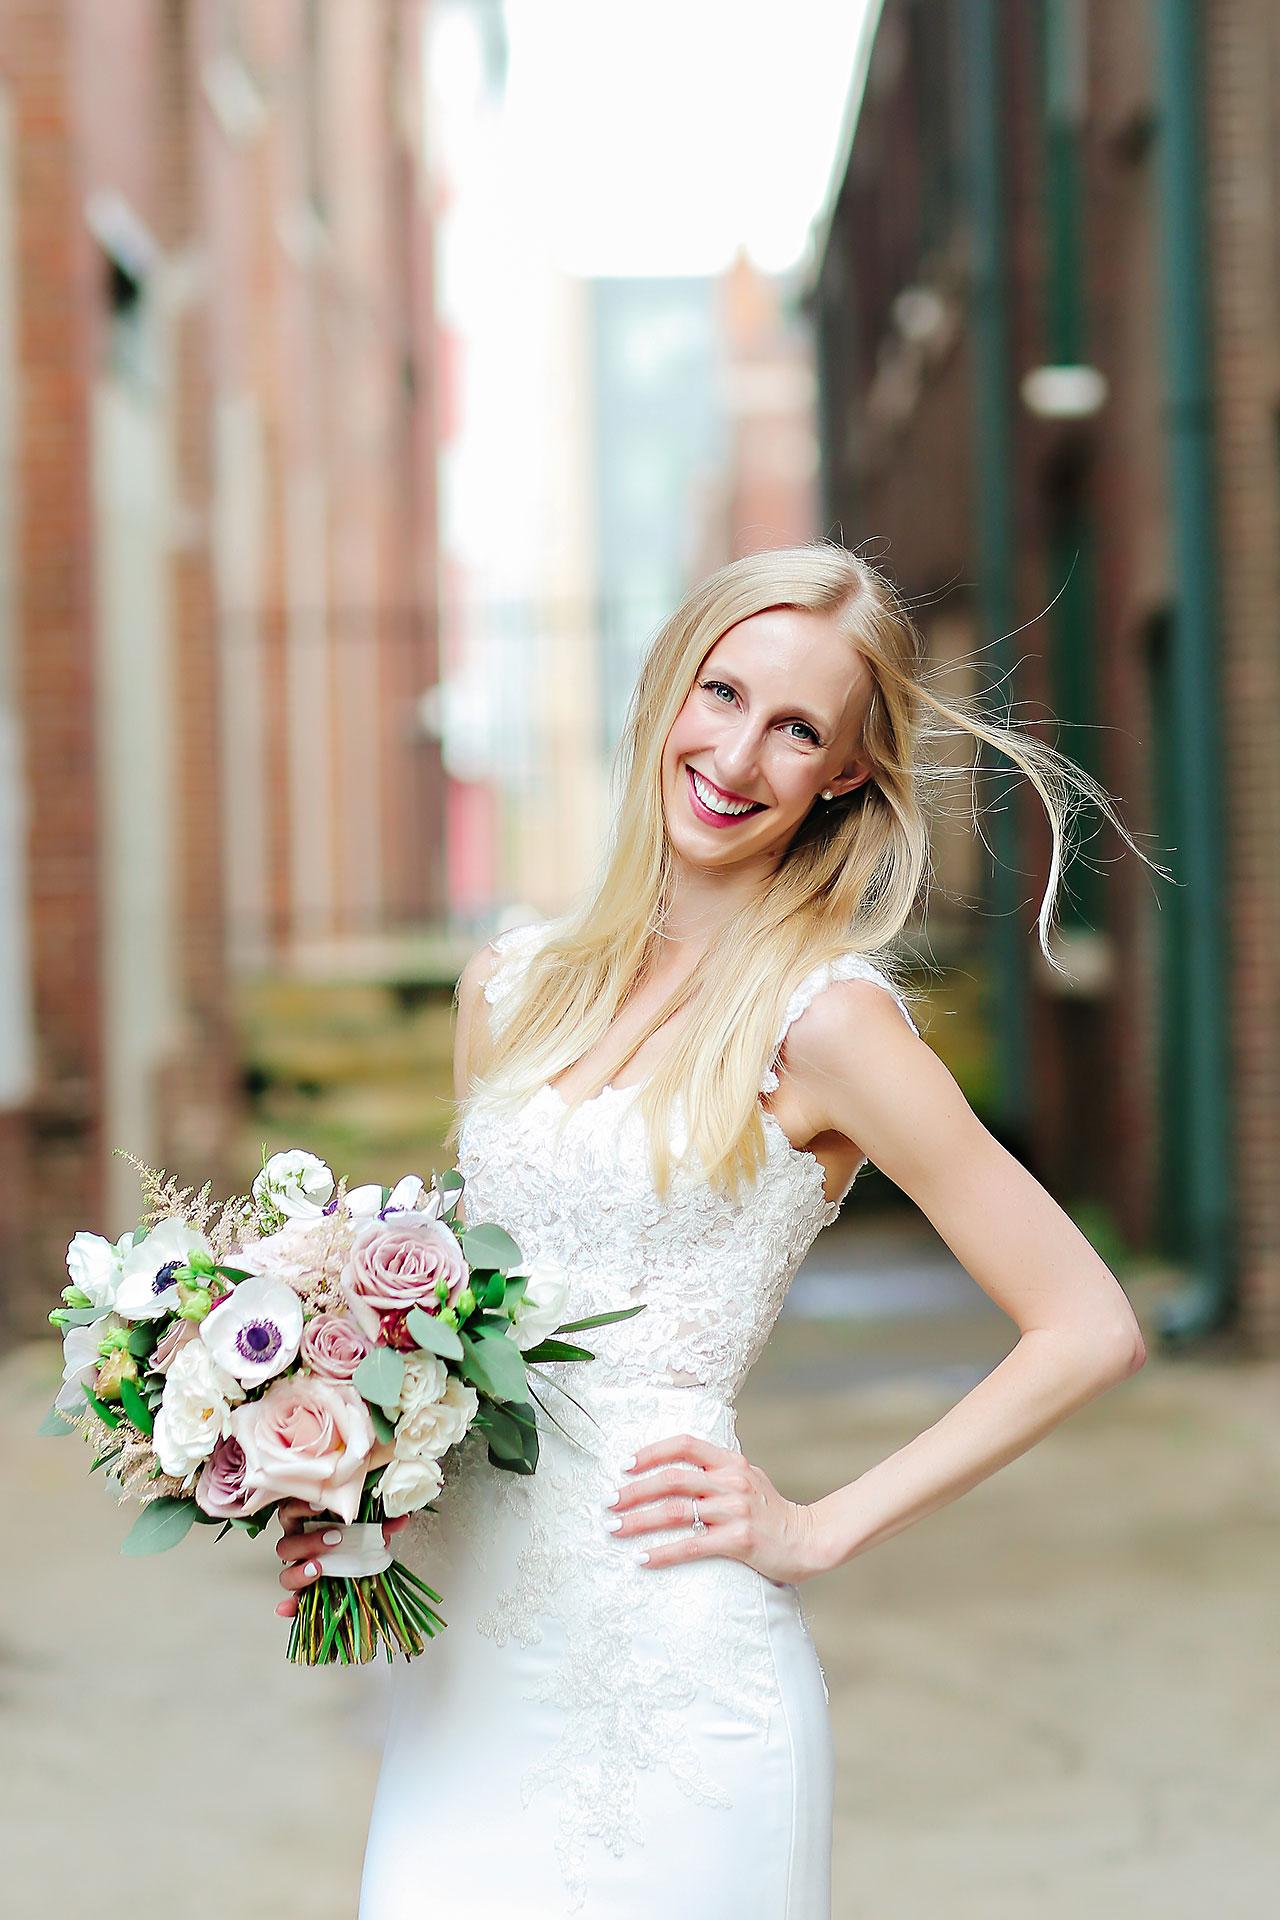 Molly Declan Scottish Rite Indianapolis Wedding 095